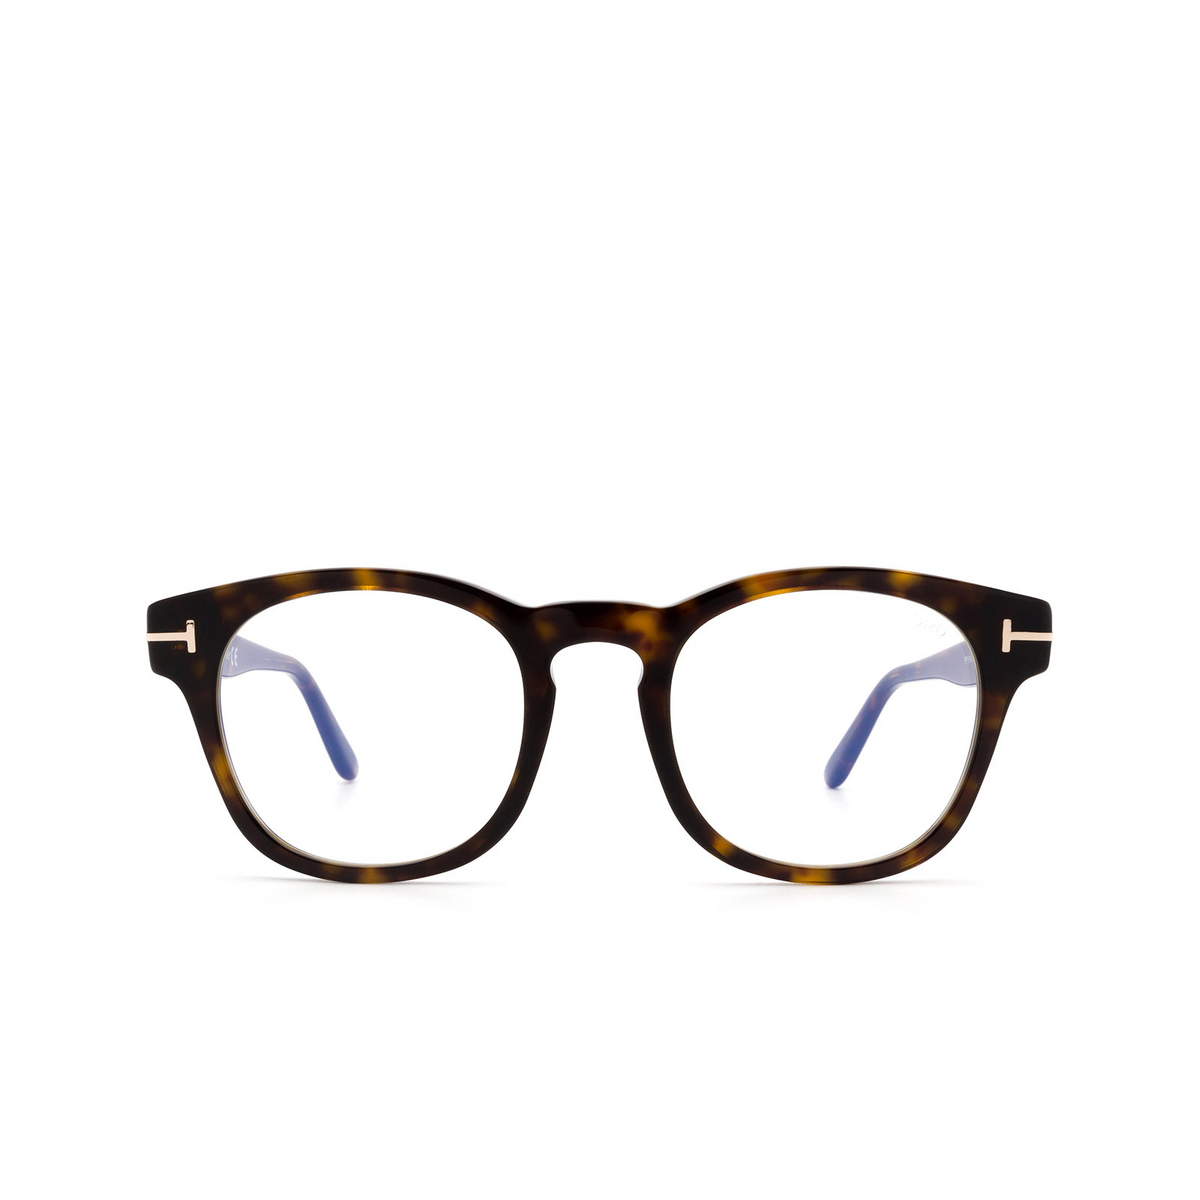 Tom Ford® Square Eyeglasses: FT5543-B color Dark Havana 052 - front view.